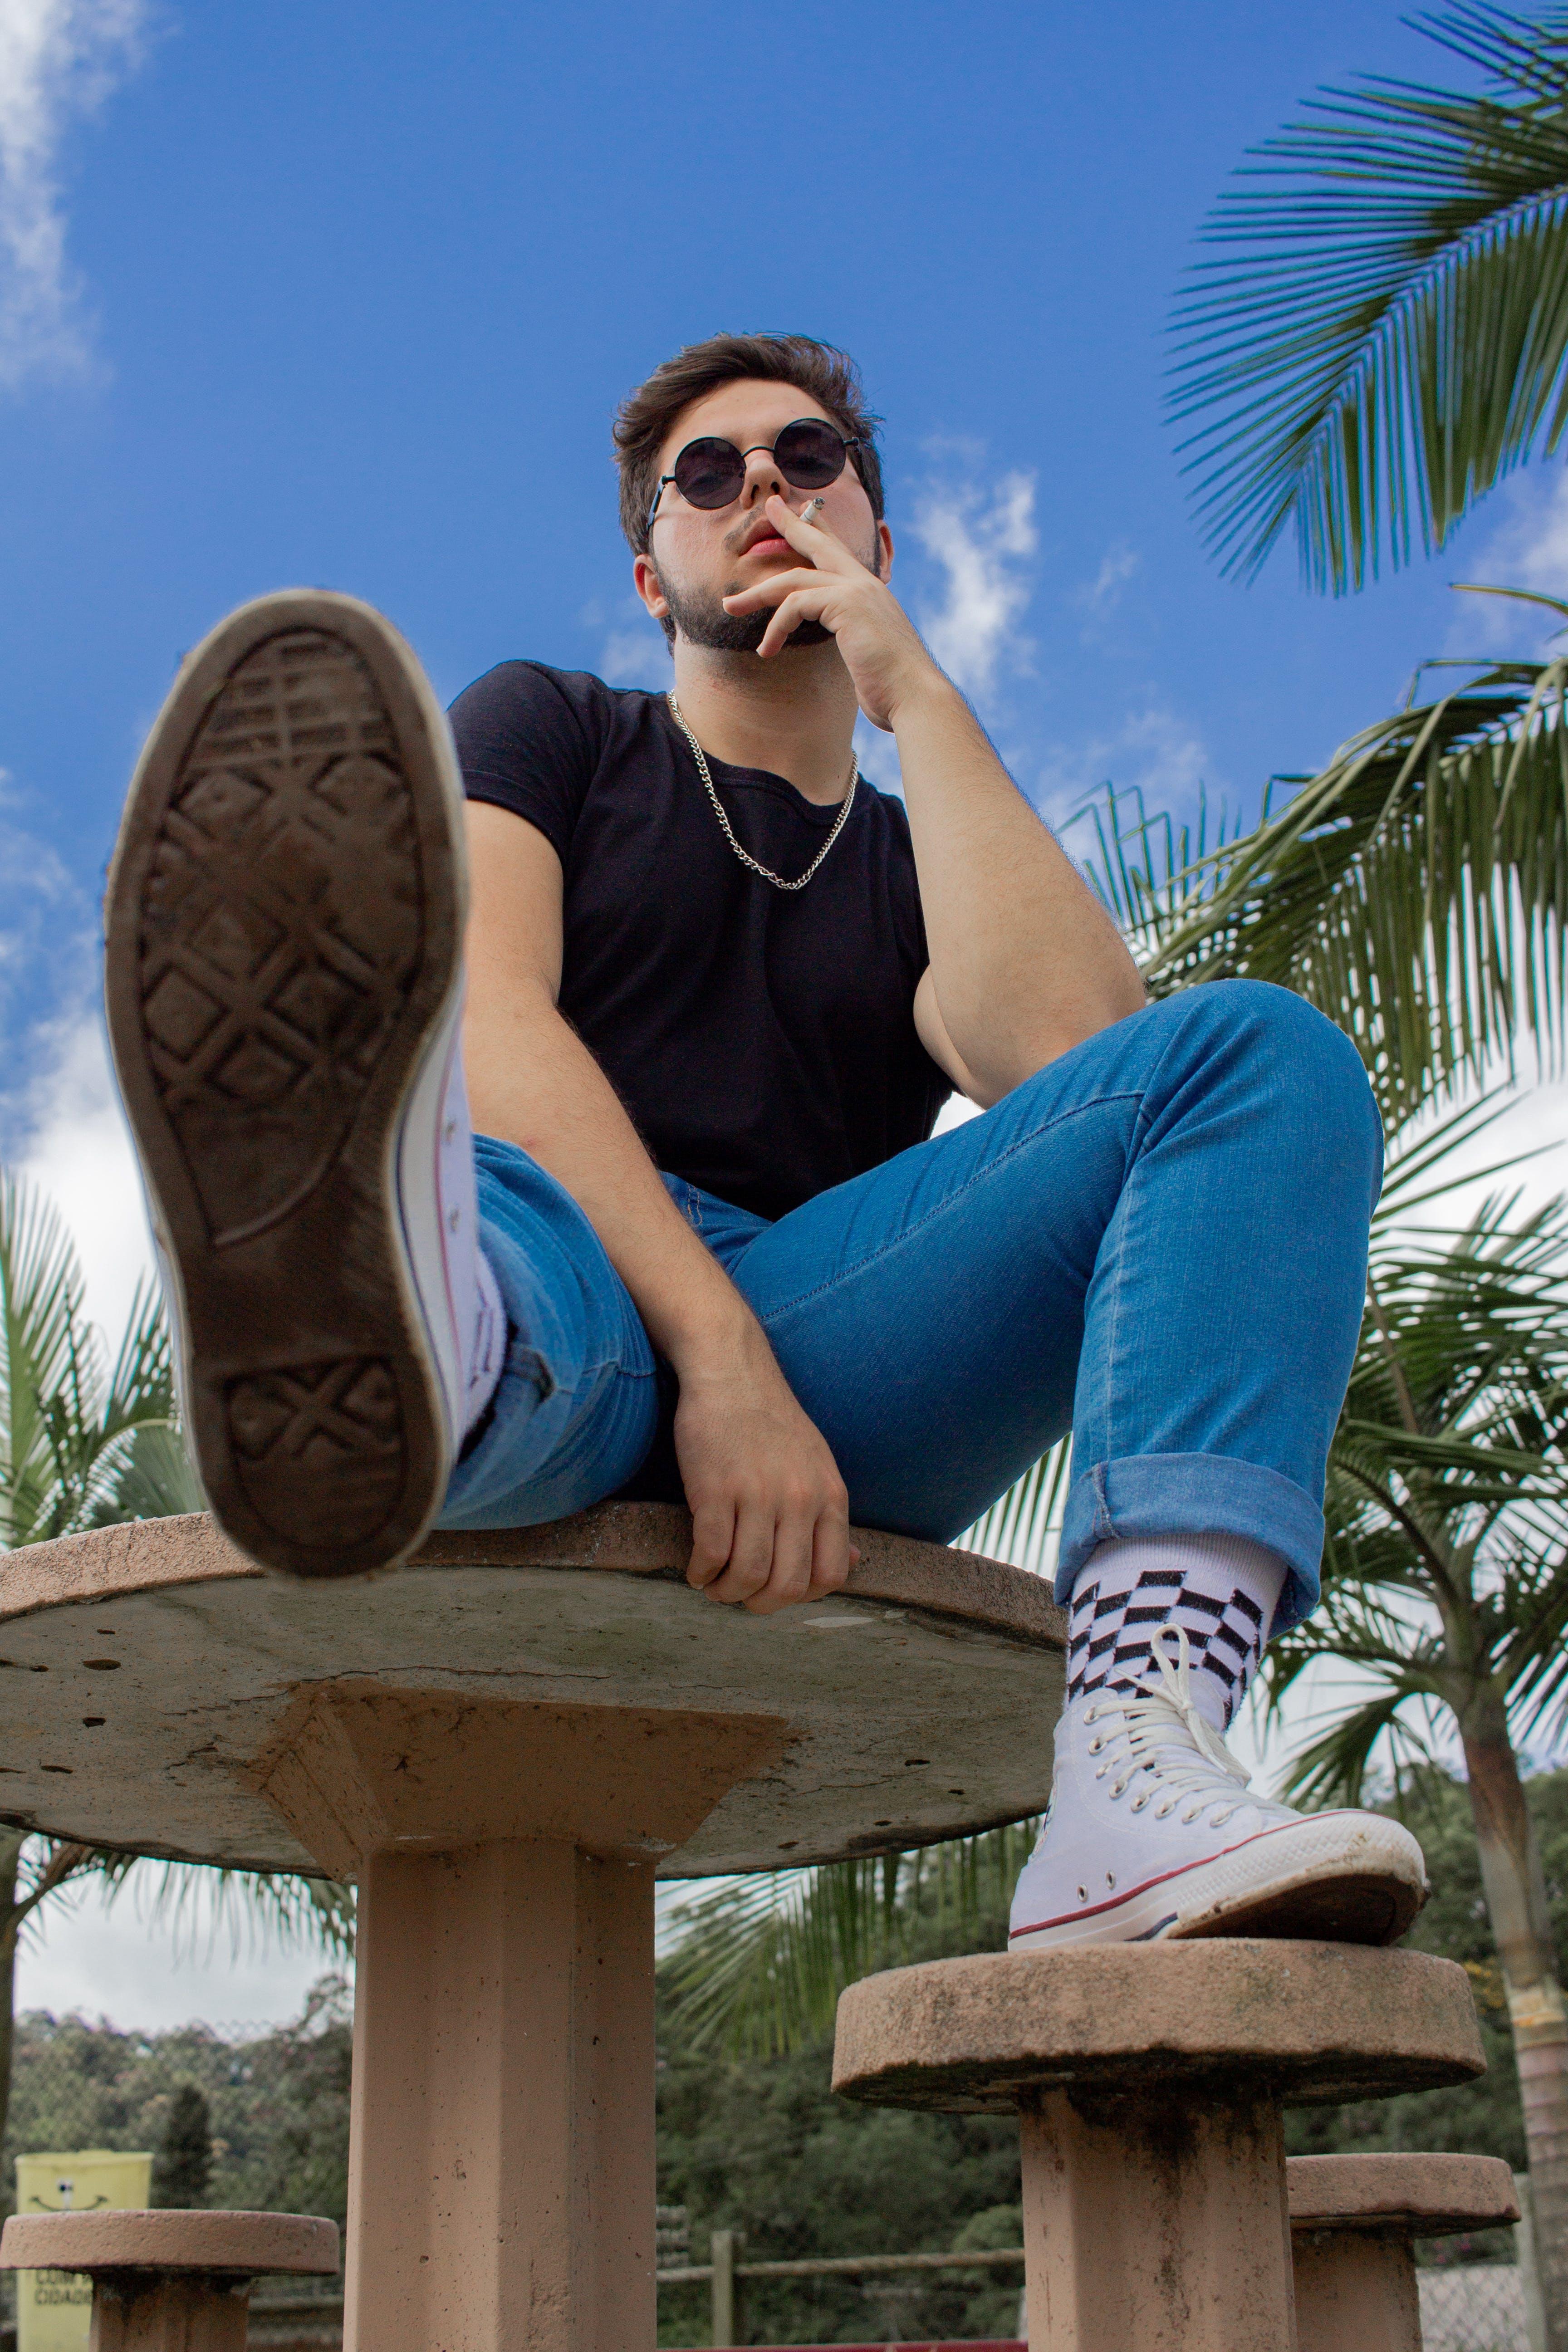 Man Sitting on Concrete Table